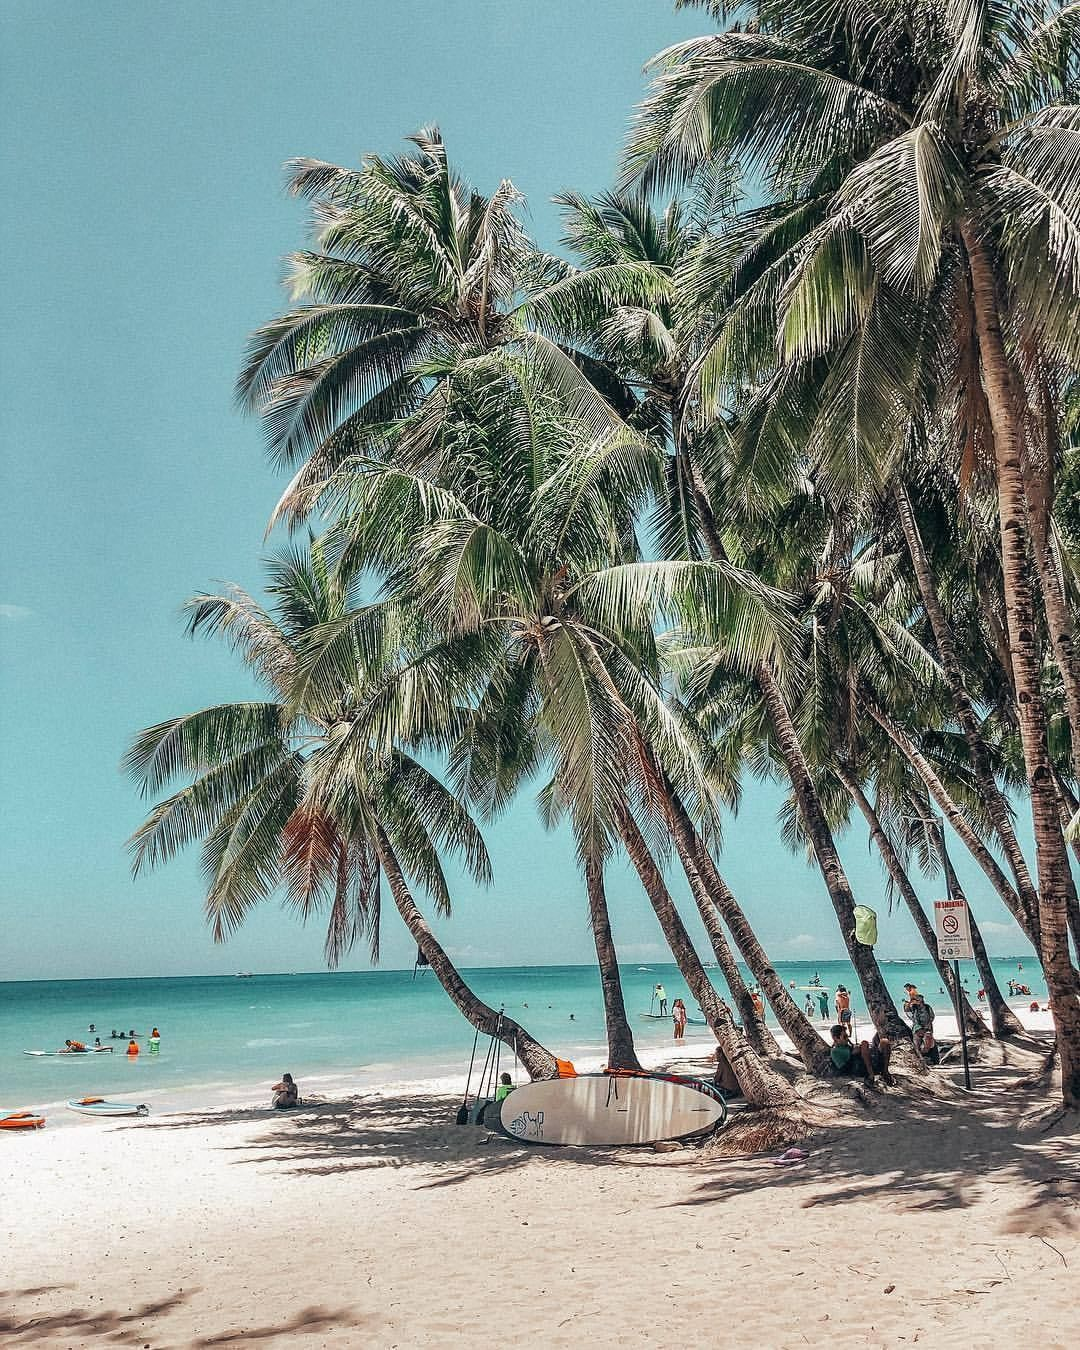 Tropical Island Beaches: See Want Travel